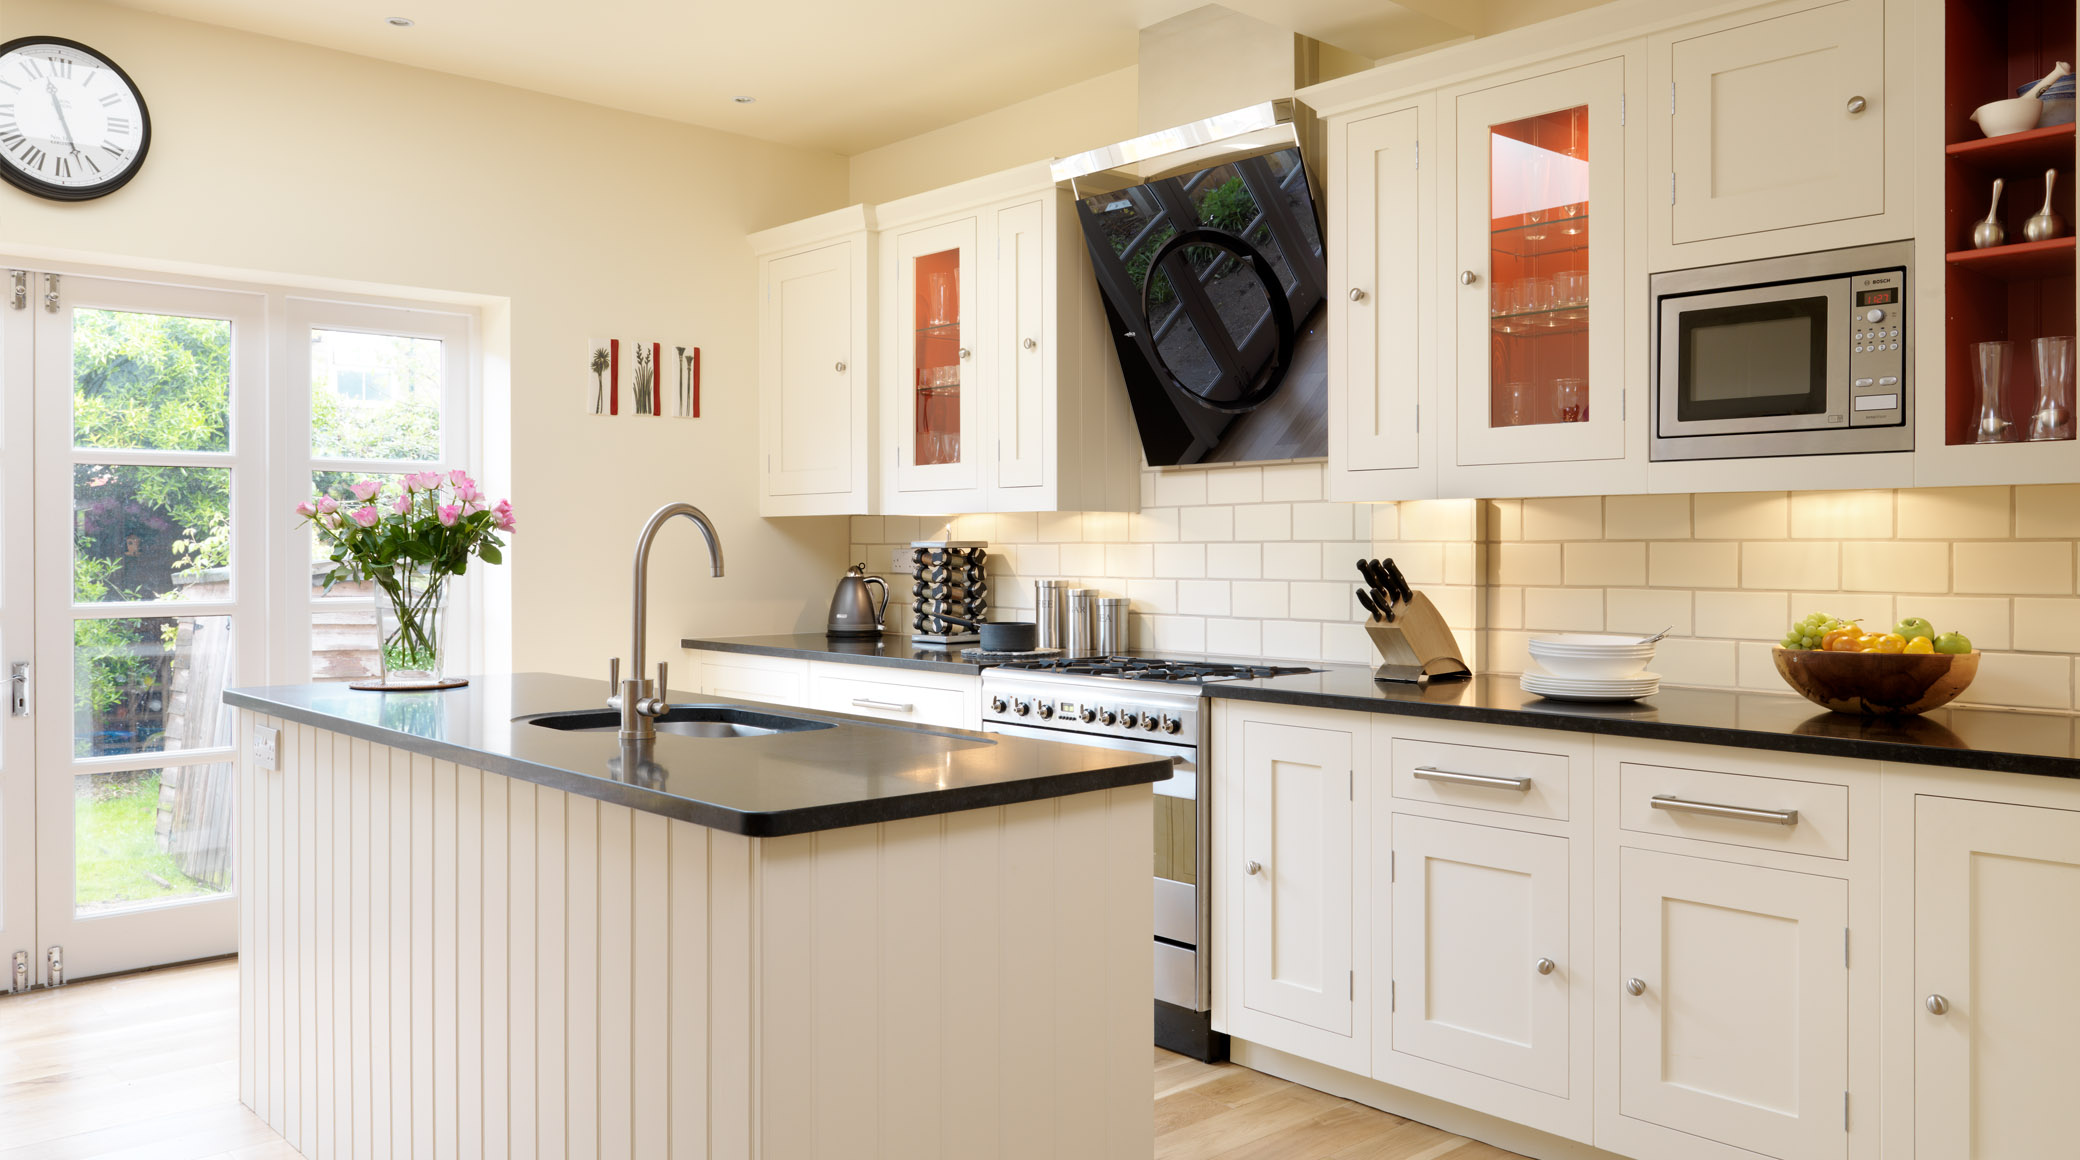 Kitchen Showrooms ヨ Black and White photo - 1